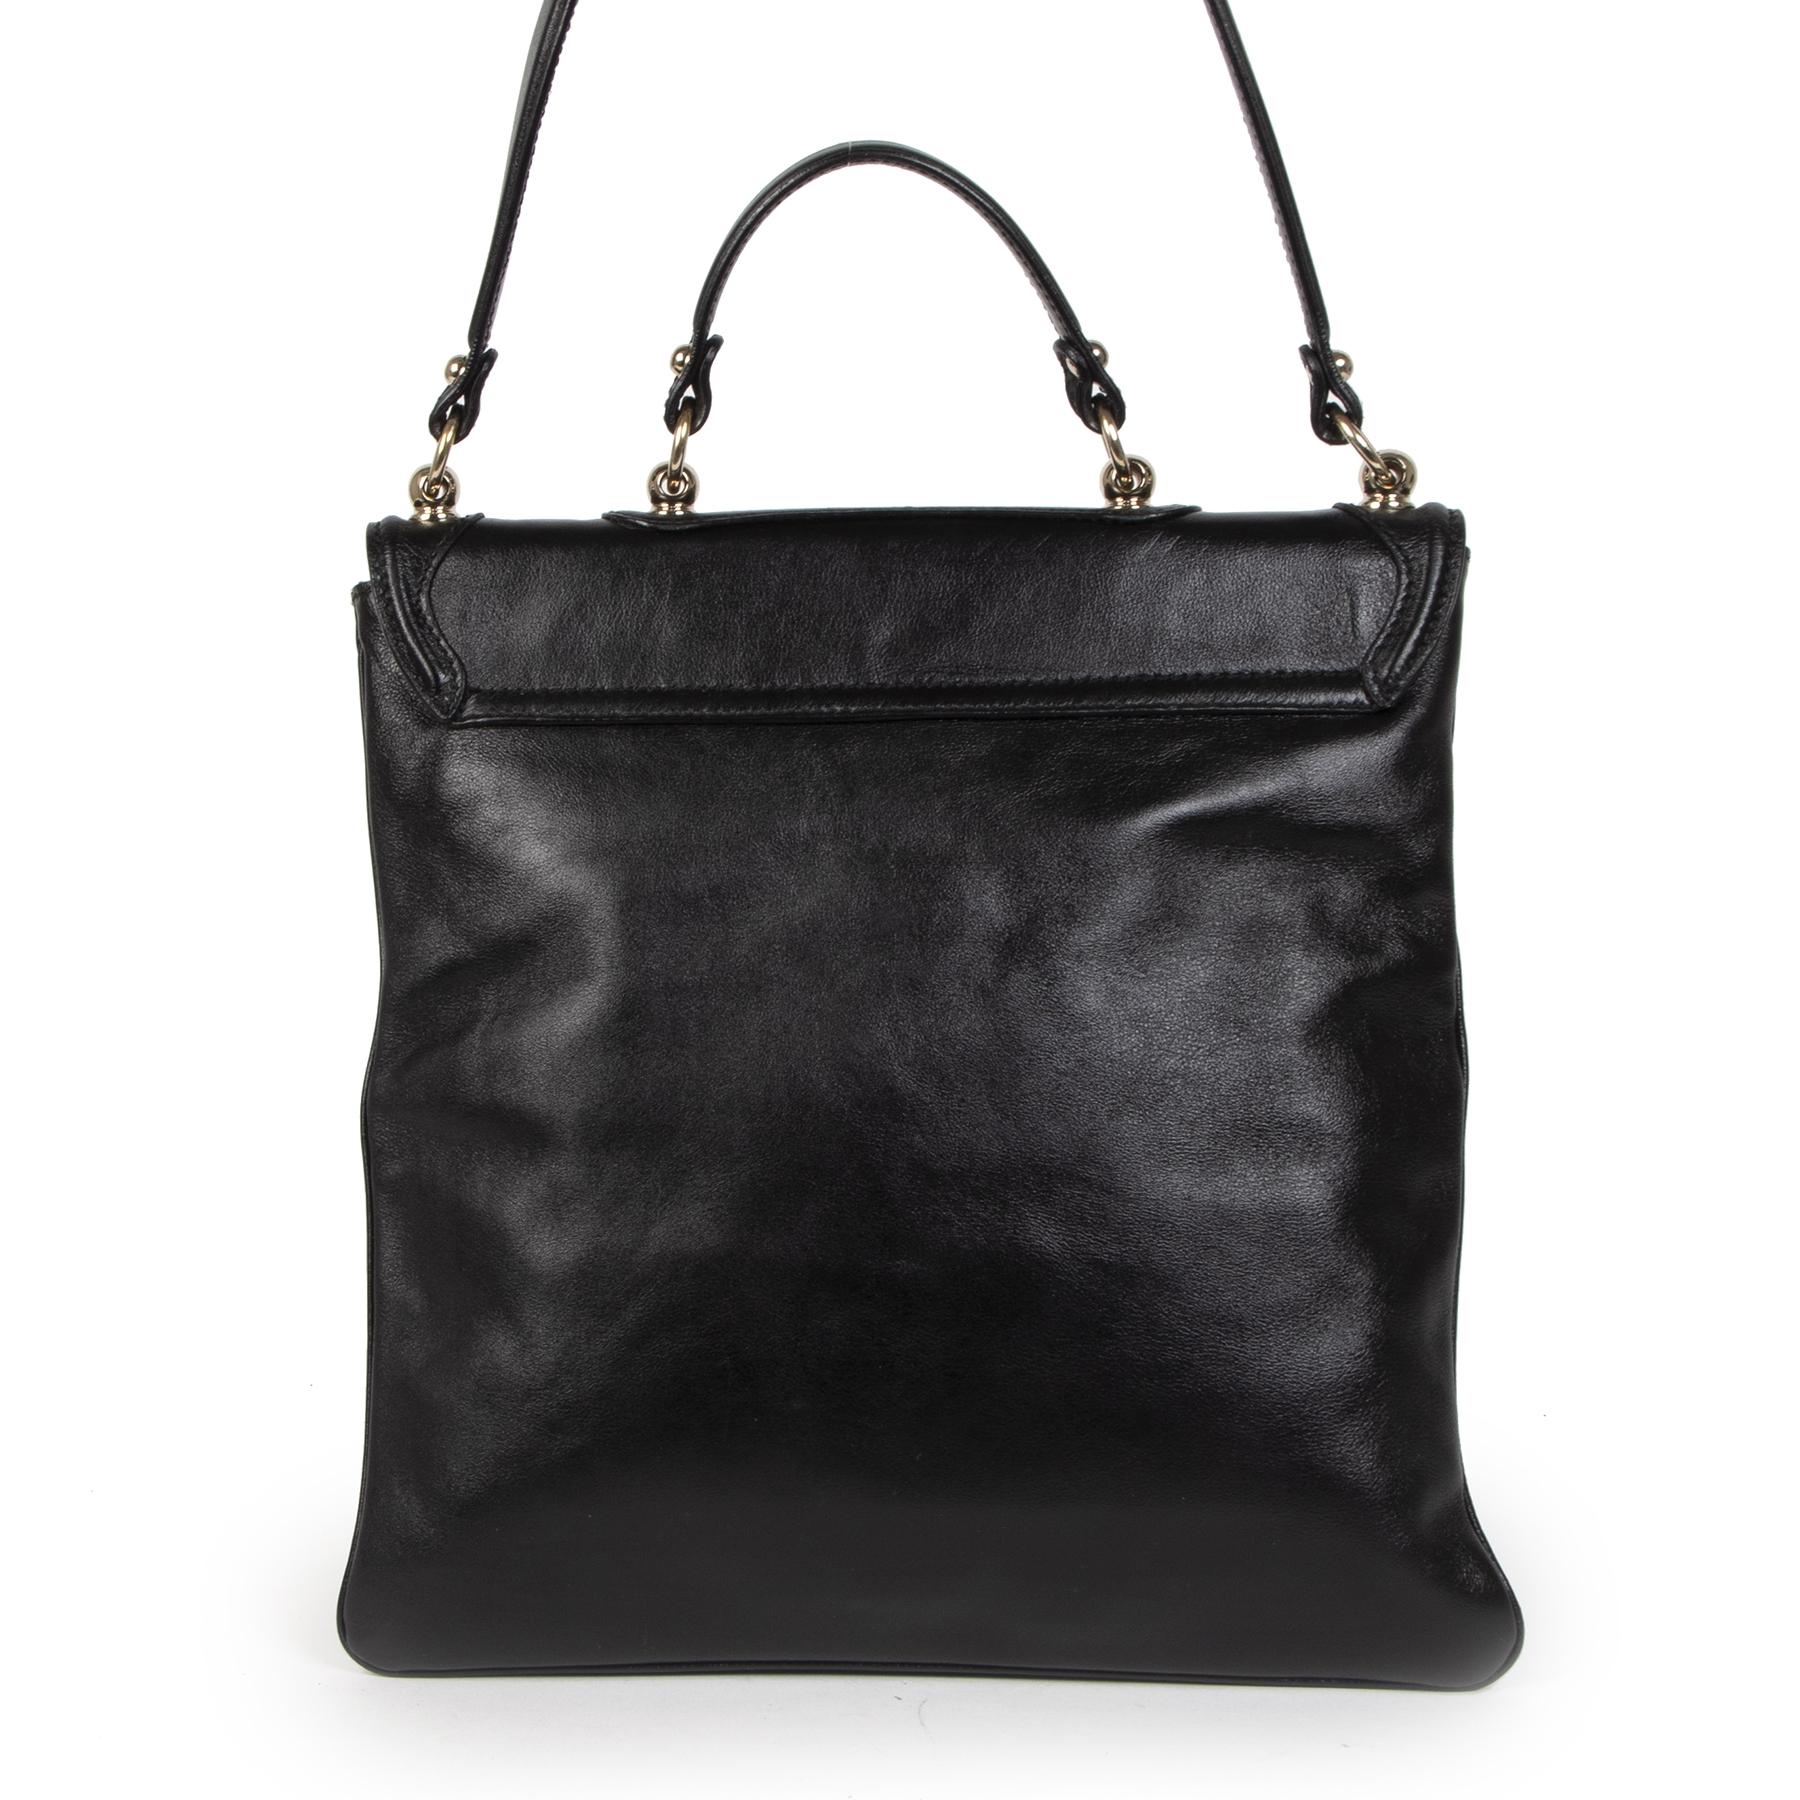 Authentieke tweedehands vintage Gucci Britt Messenger Bag koop online webshop LabelLOV